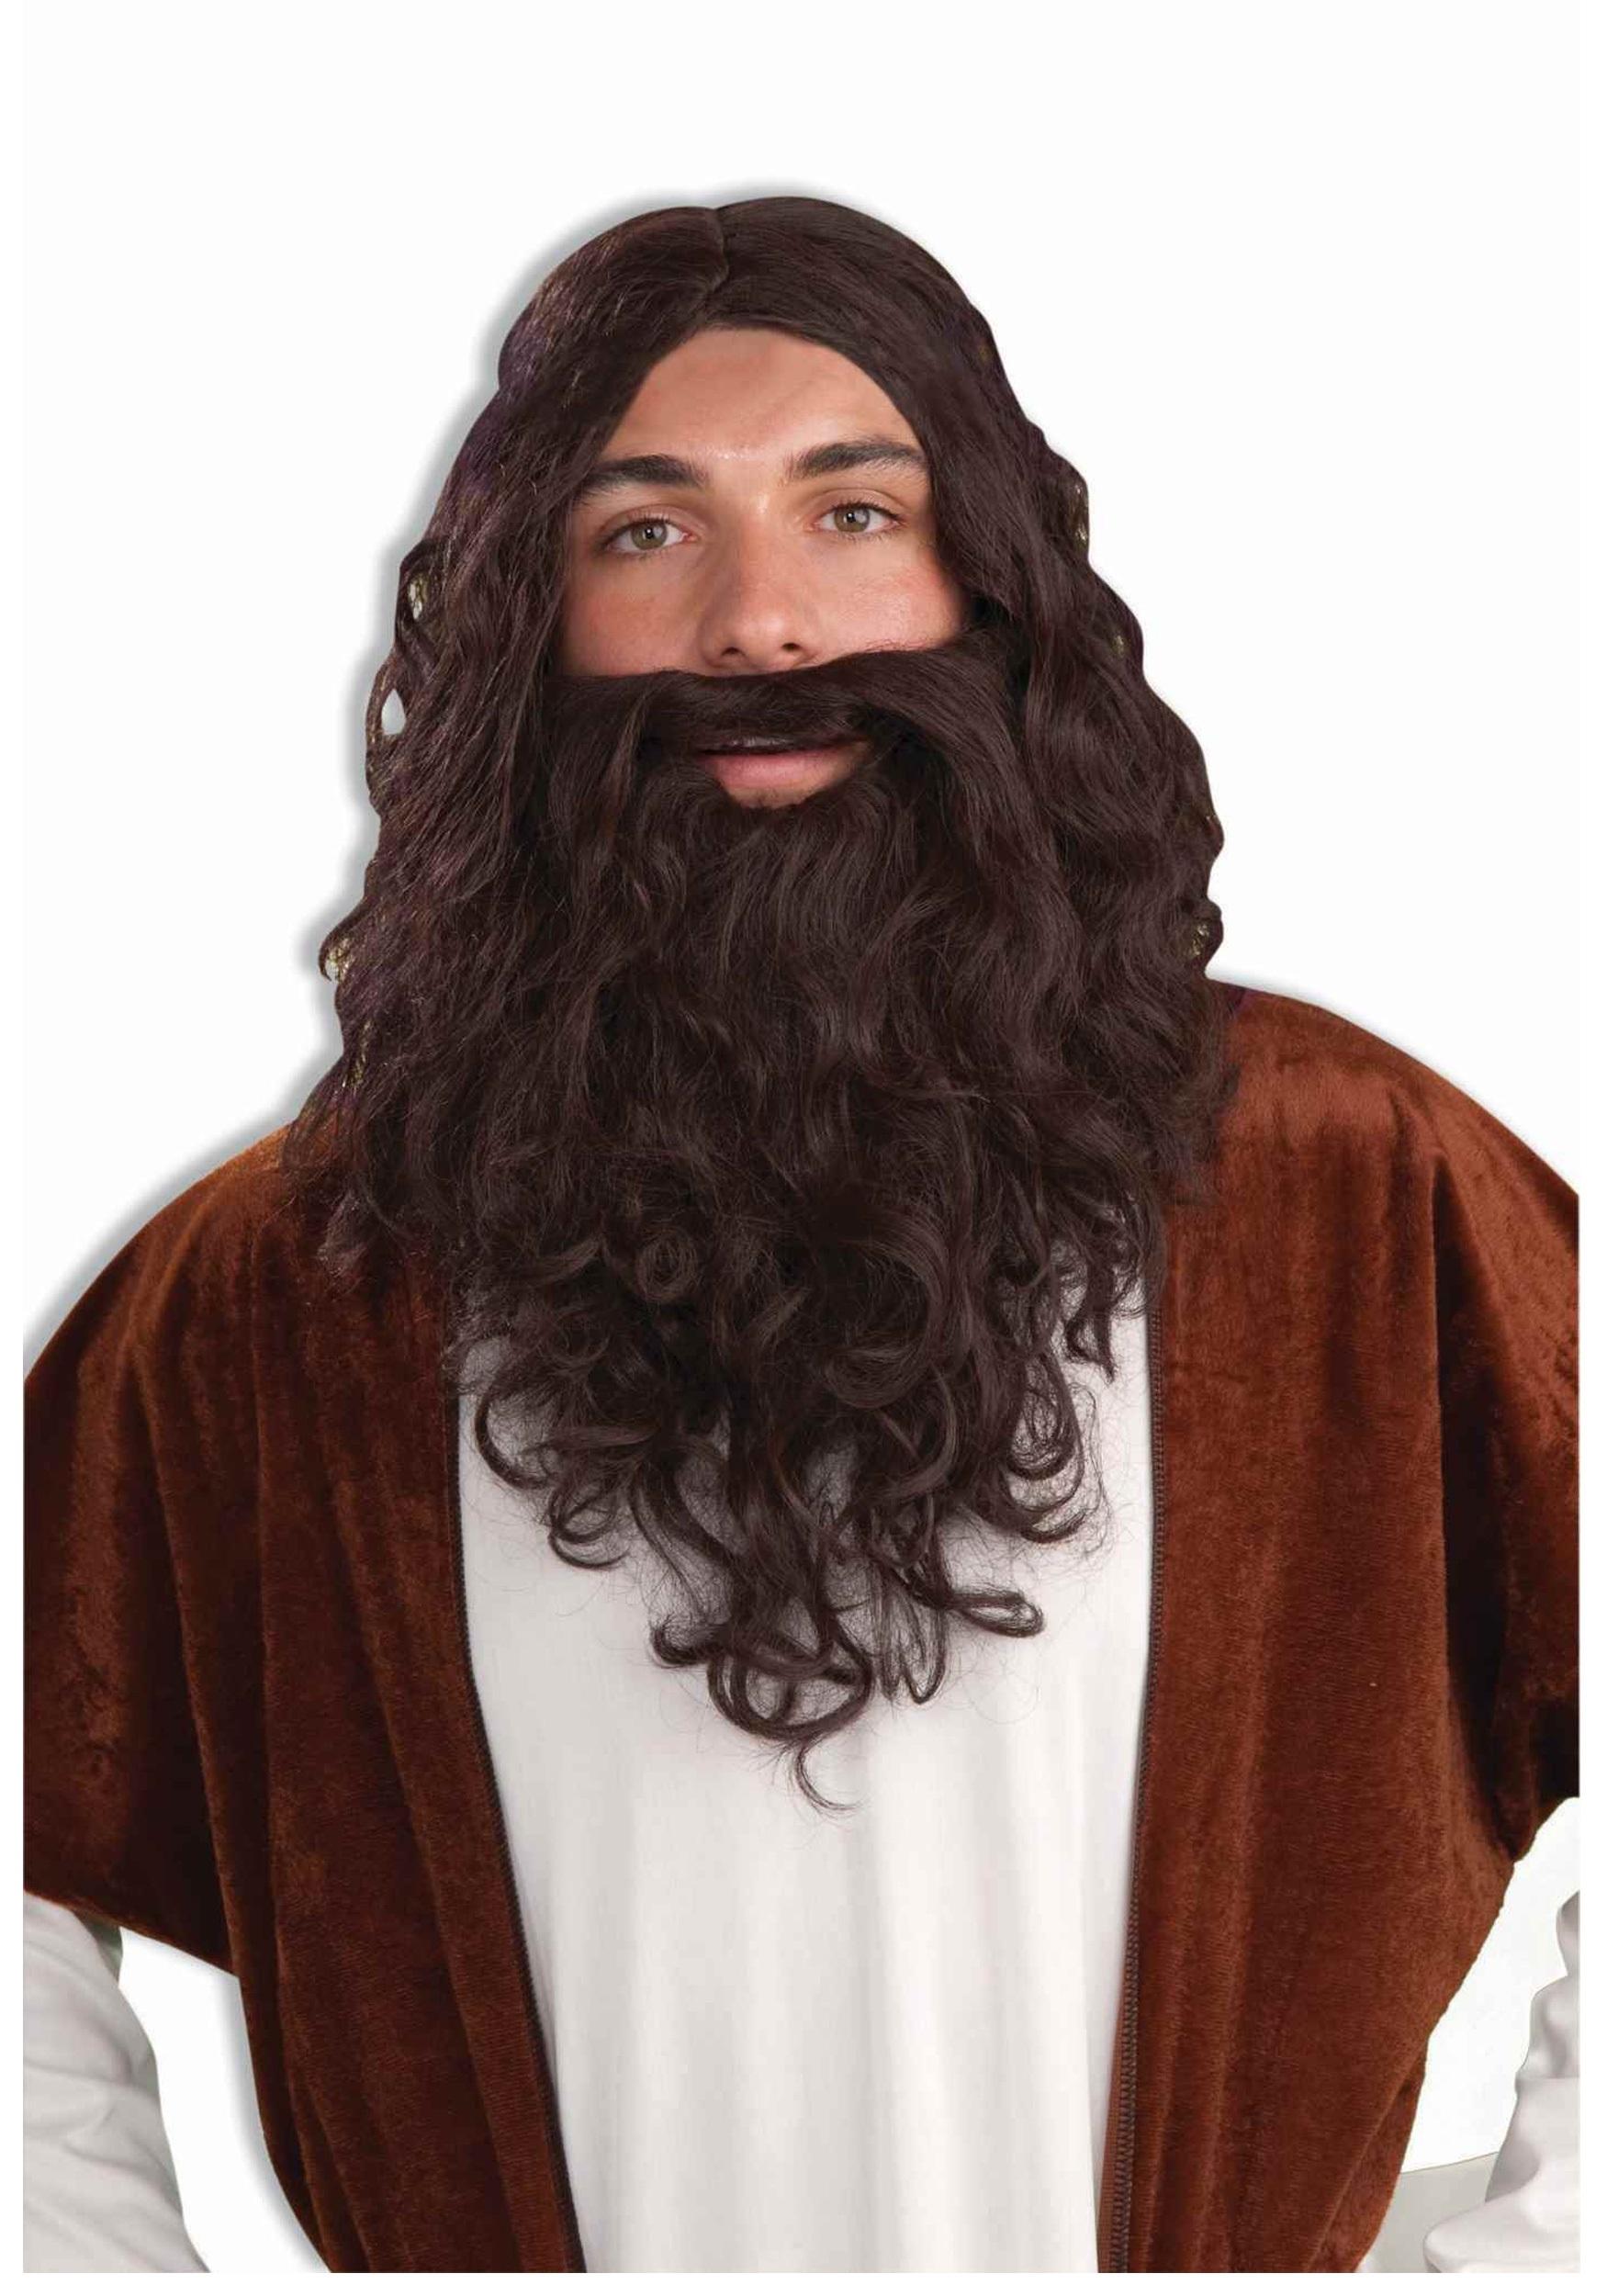 Men's Biblical Wig and Beard Set